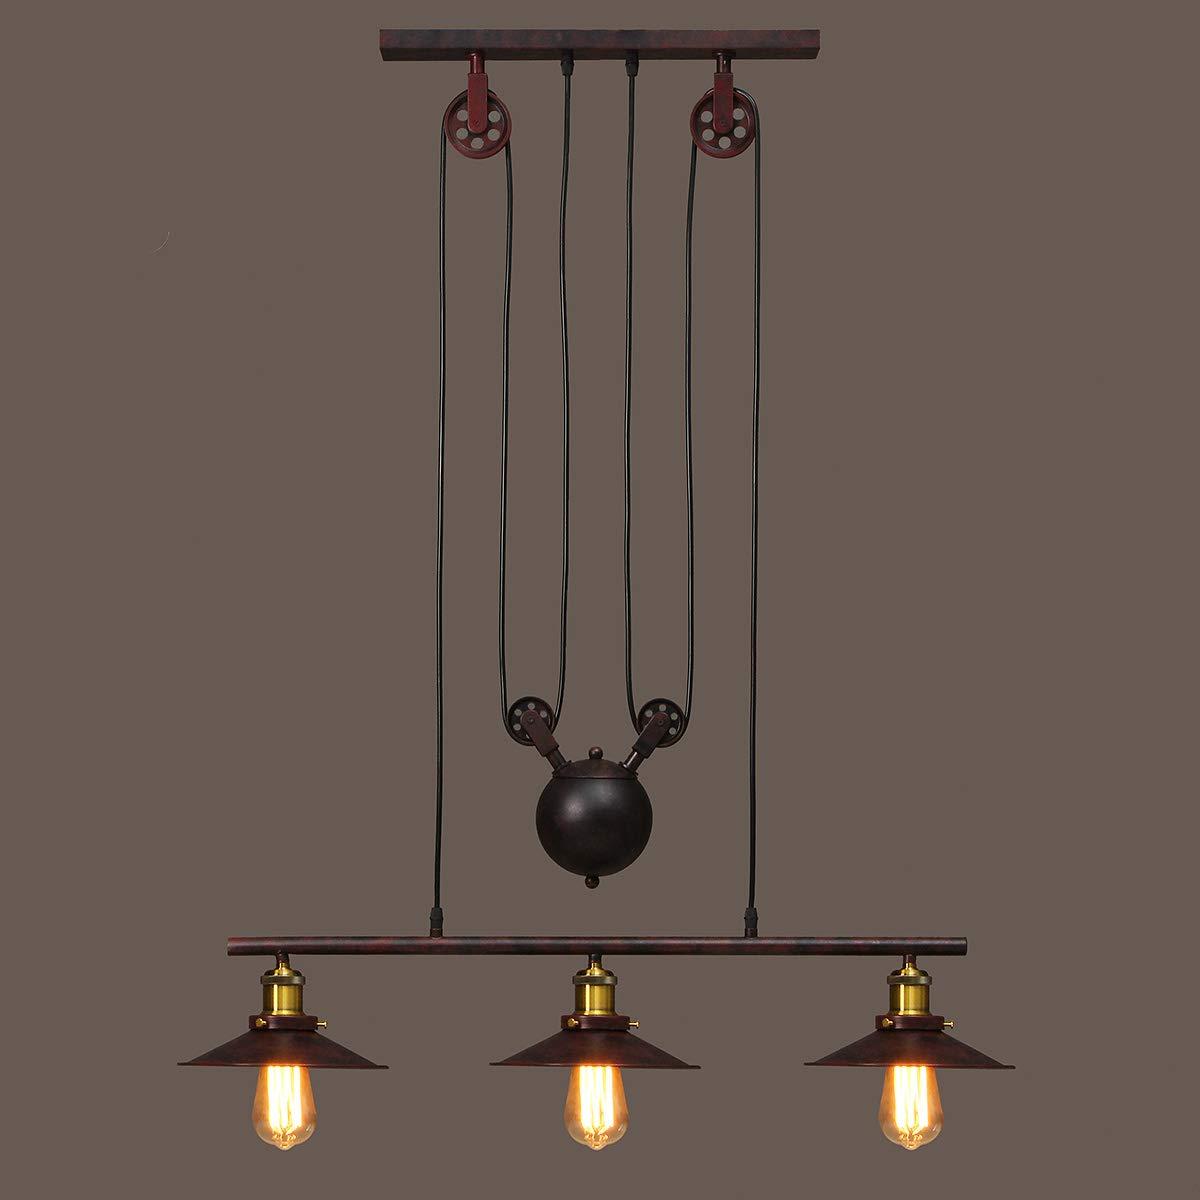 Kingso 3 Light Industrial Vintage Chandeliers Pulley Pendant Light